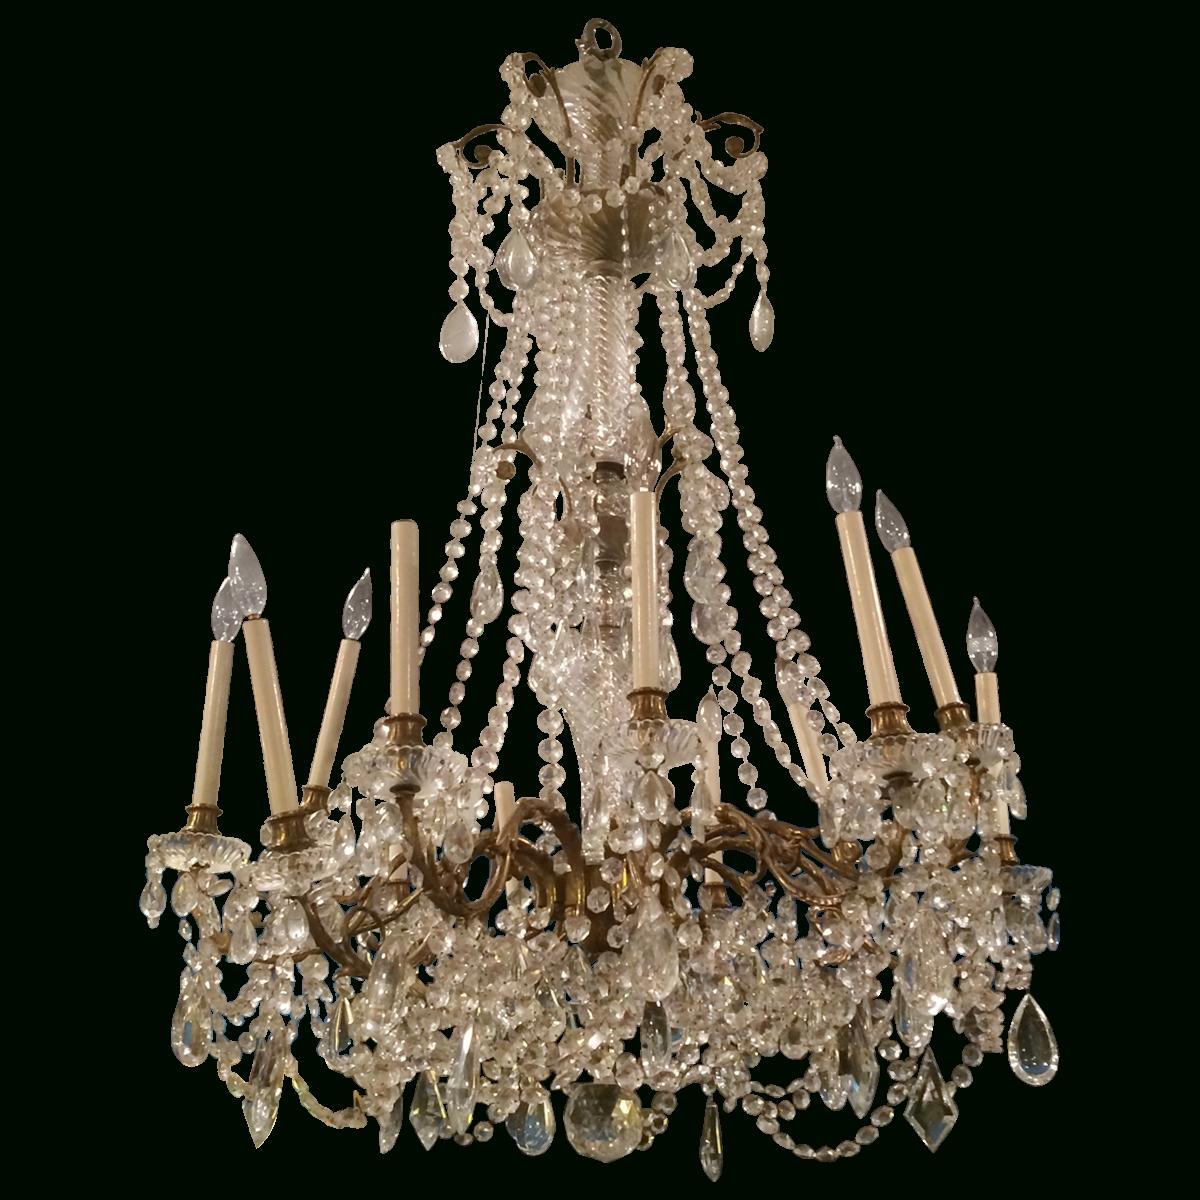 Most Popular Chandelier : Black Chandelier Vintage Brass Chandelier Bedroom Within Vintage French Chandeliers (View 13 of 20)